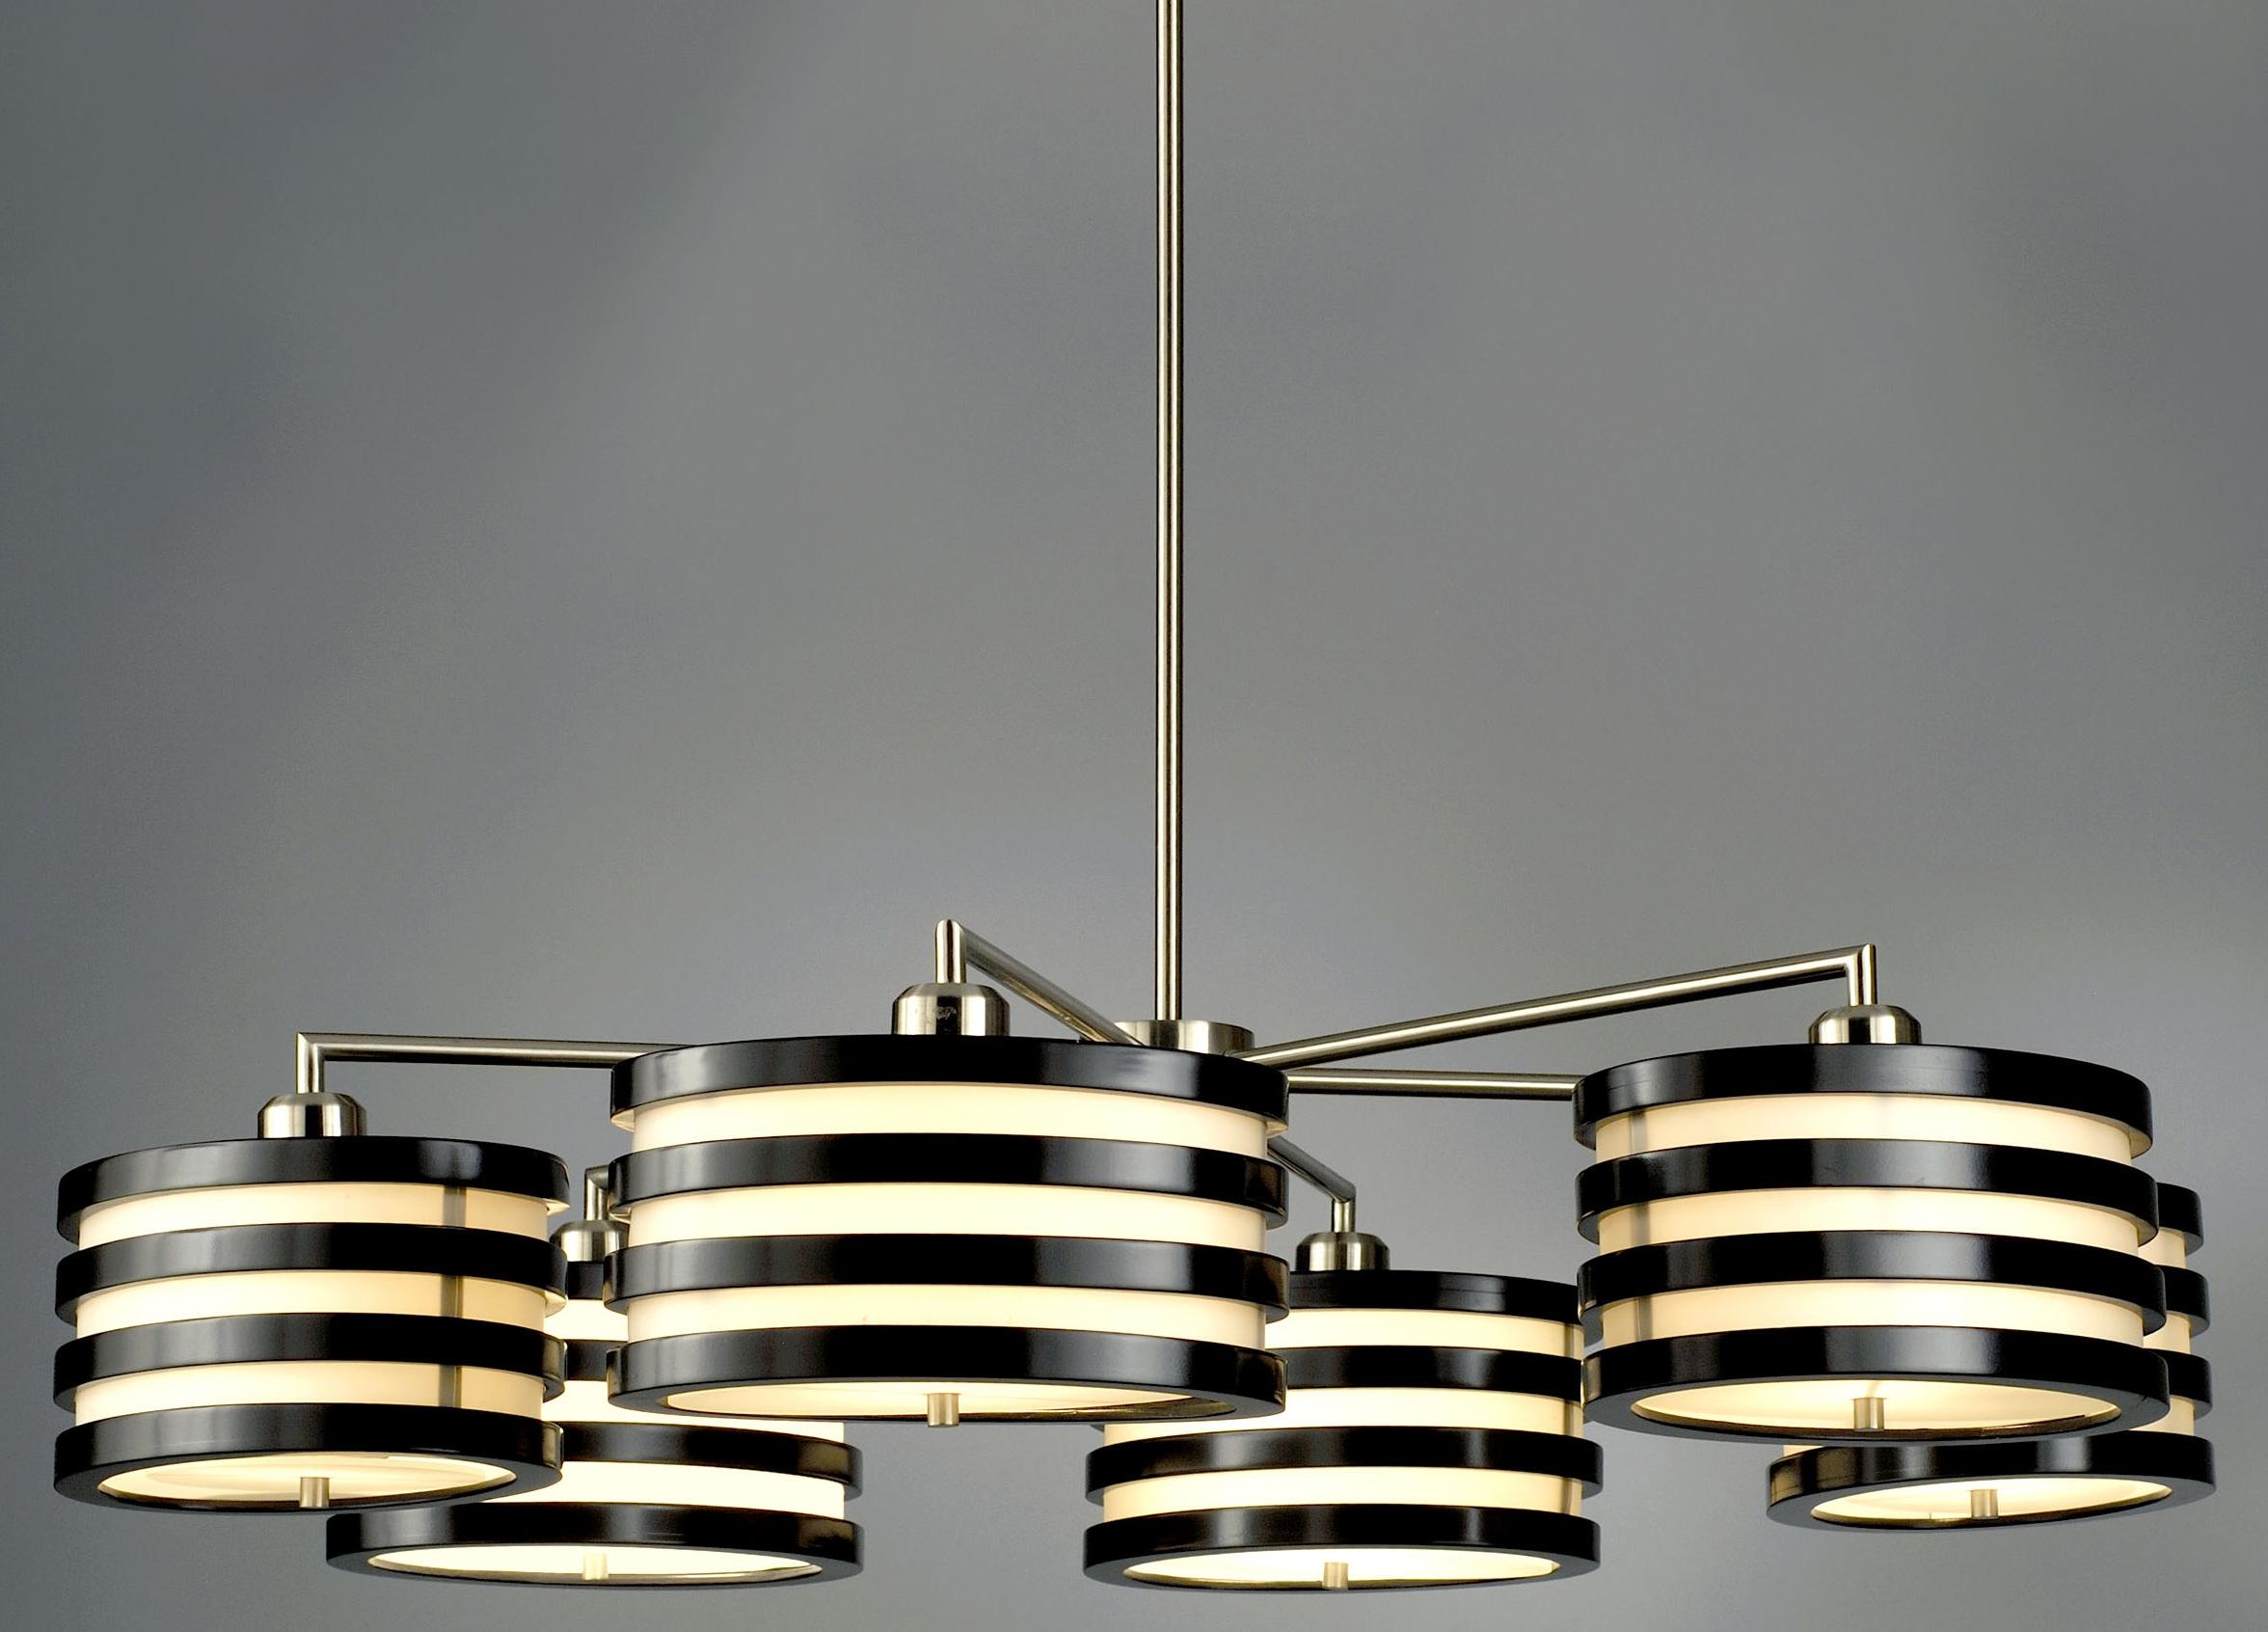 Popular Photo of Modern Chandelier Lighting